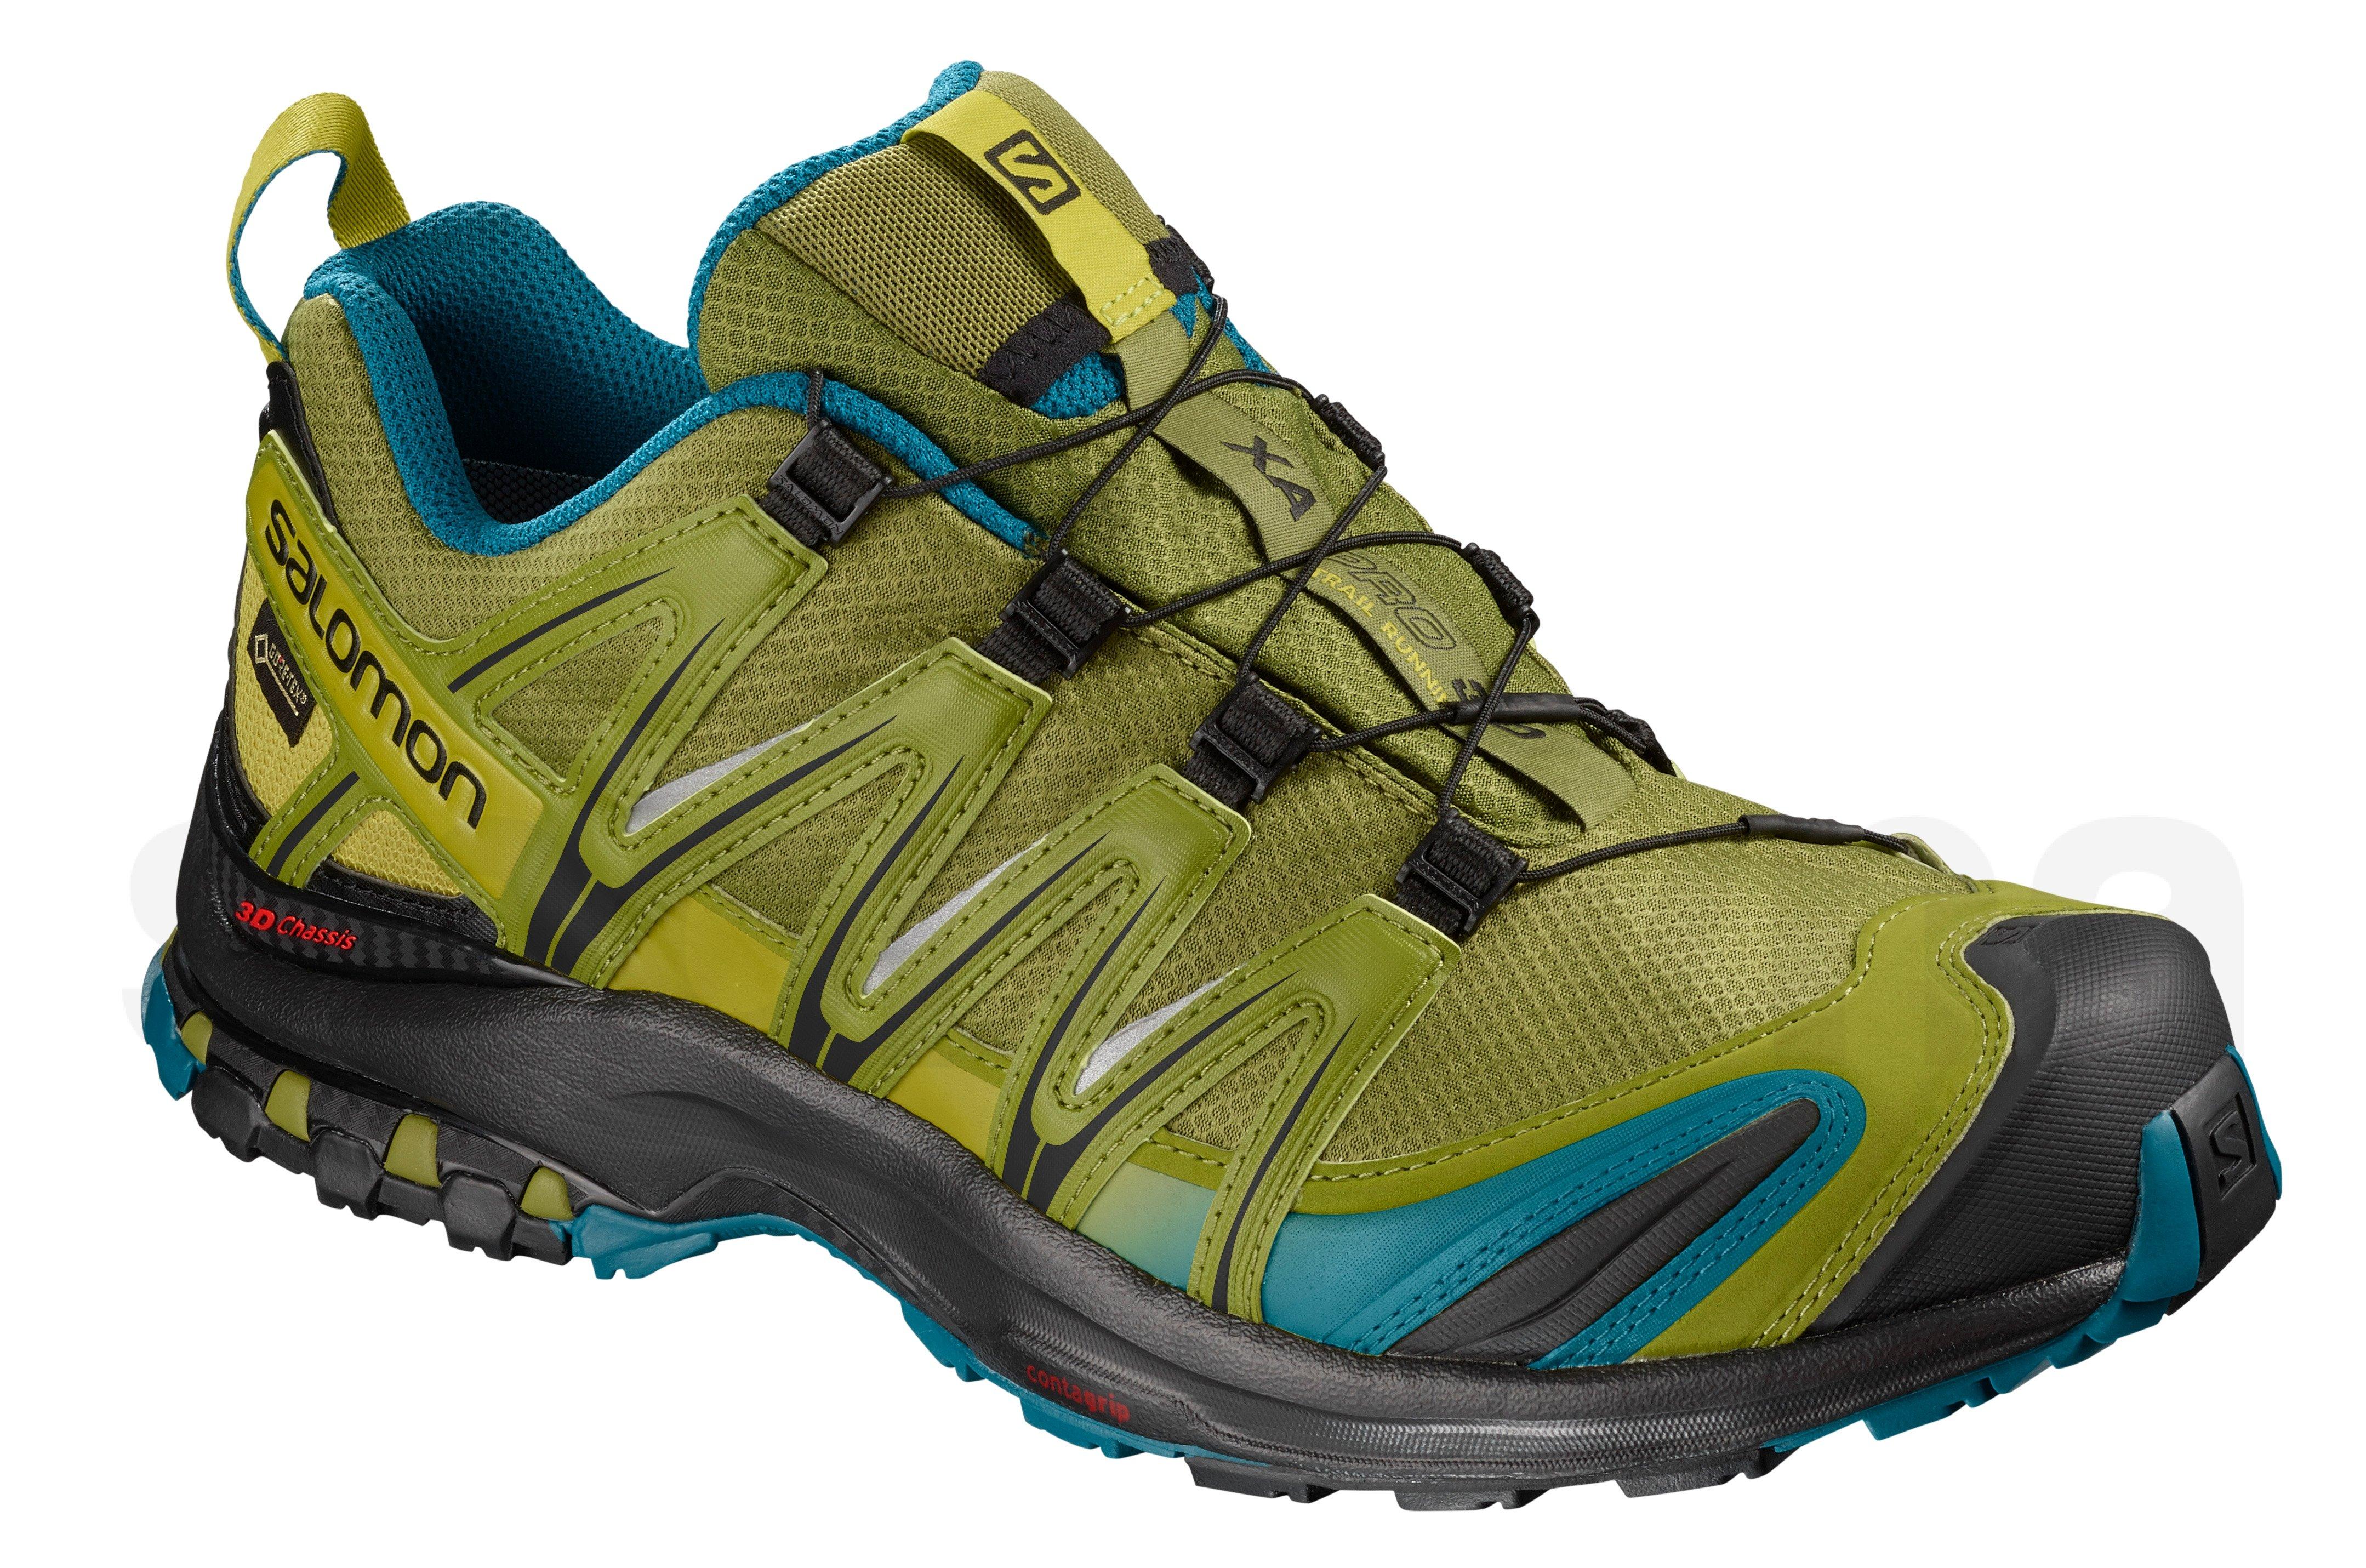 18497e2378 Pánská trailová běžecká obuv Salomon XA PRO 3D GTX M Quacamole Deep -  L40472000. L40472000 0 M xa pro 3d gtx guacamole.jpg.cq5dam.web.4317.2861